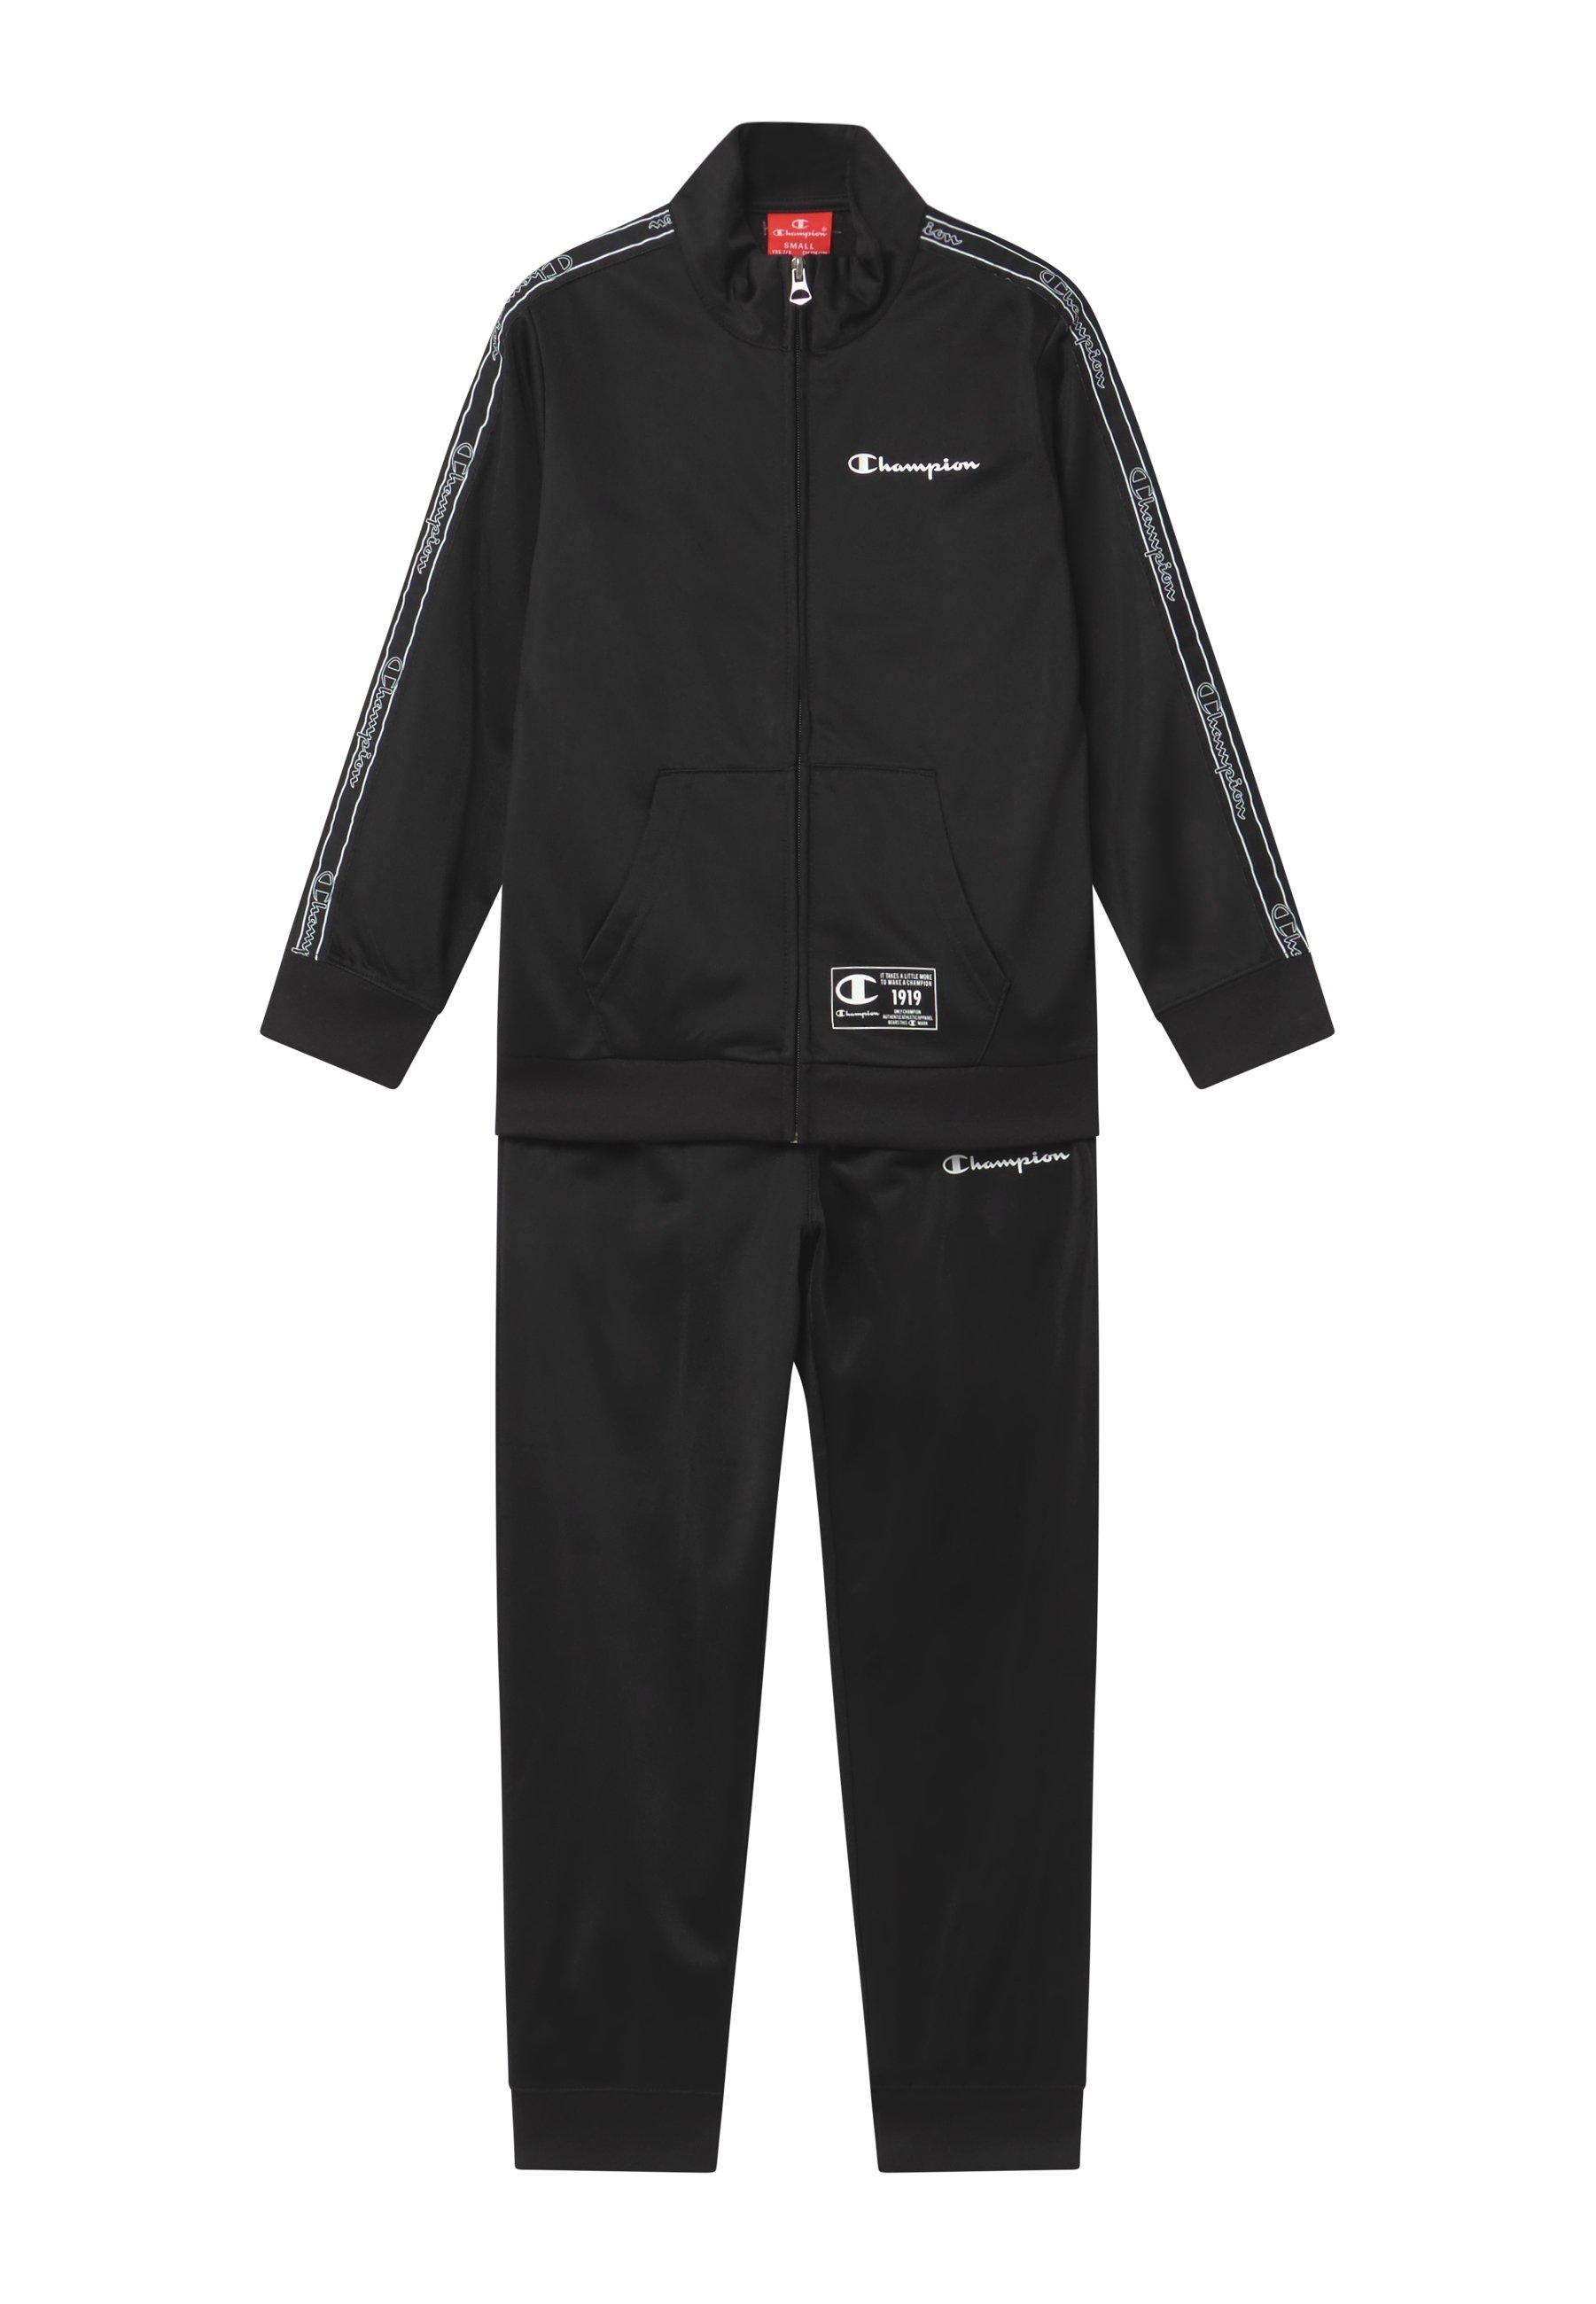 Champion | La marque sportswear disponible sur Zalando